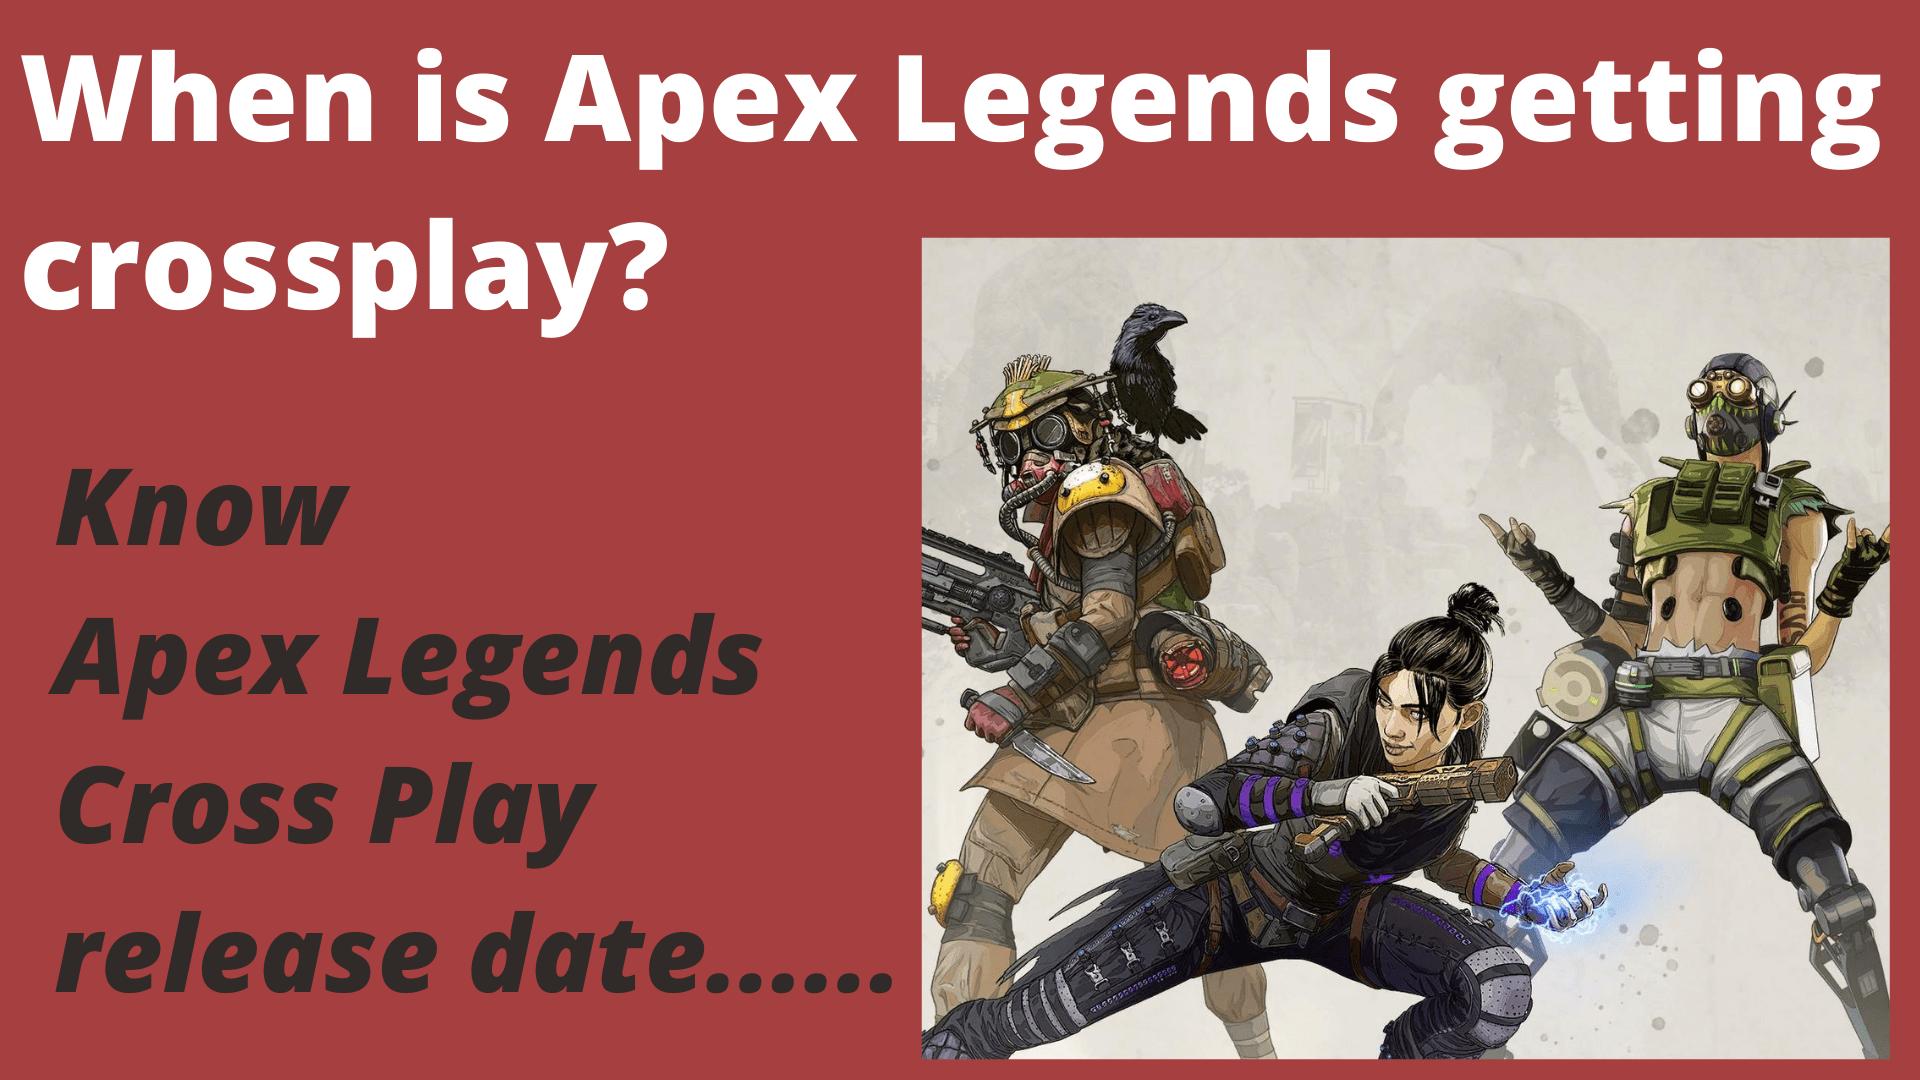 Apex Legends Cross Play release date